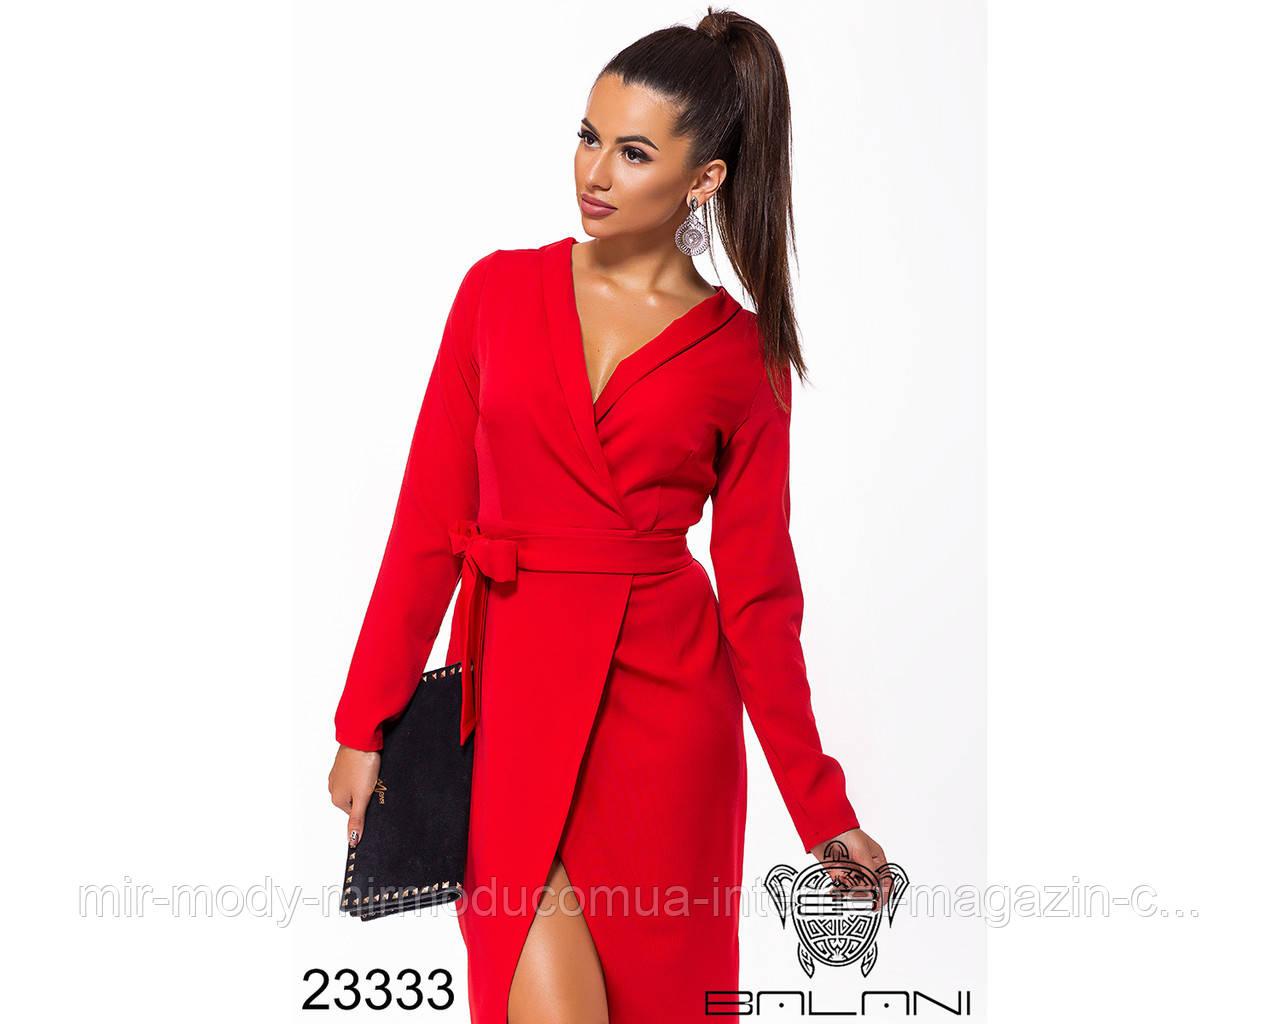 Платье на запах- 23333 с 42 по 46 размер (бн)